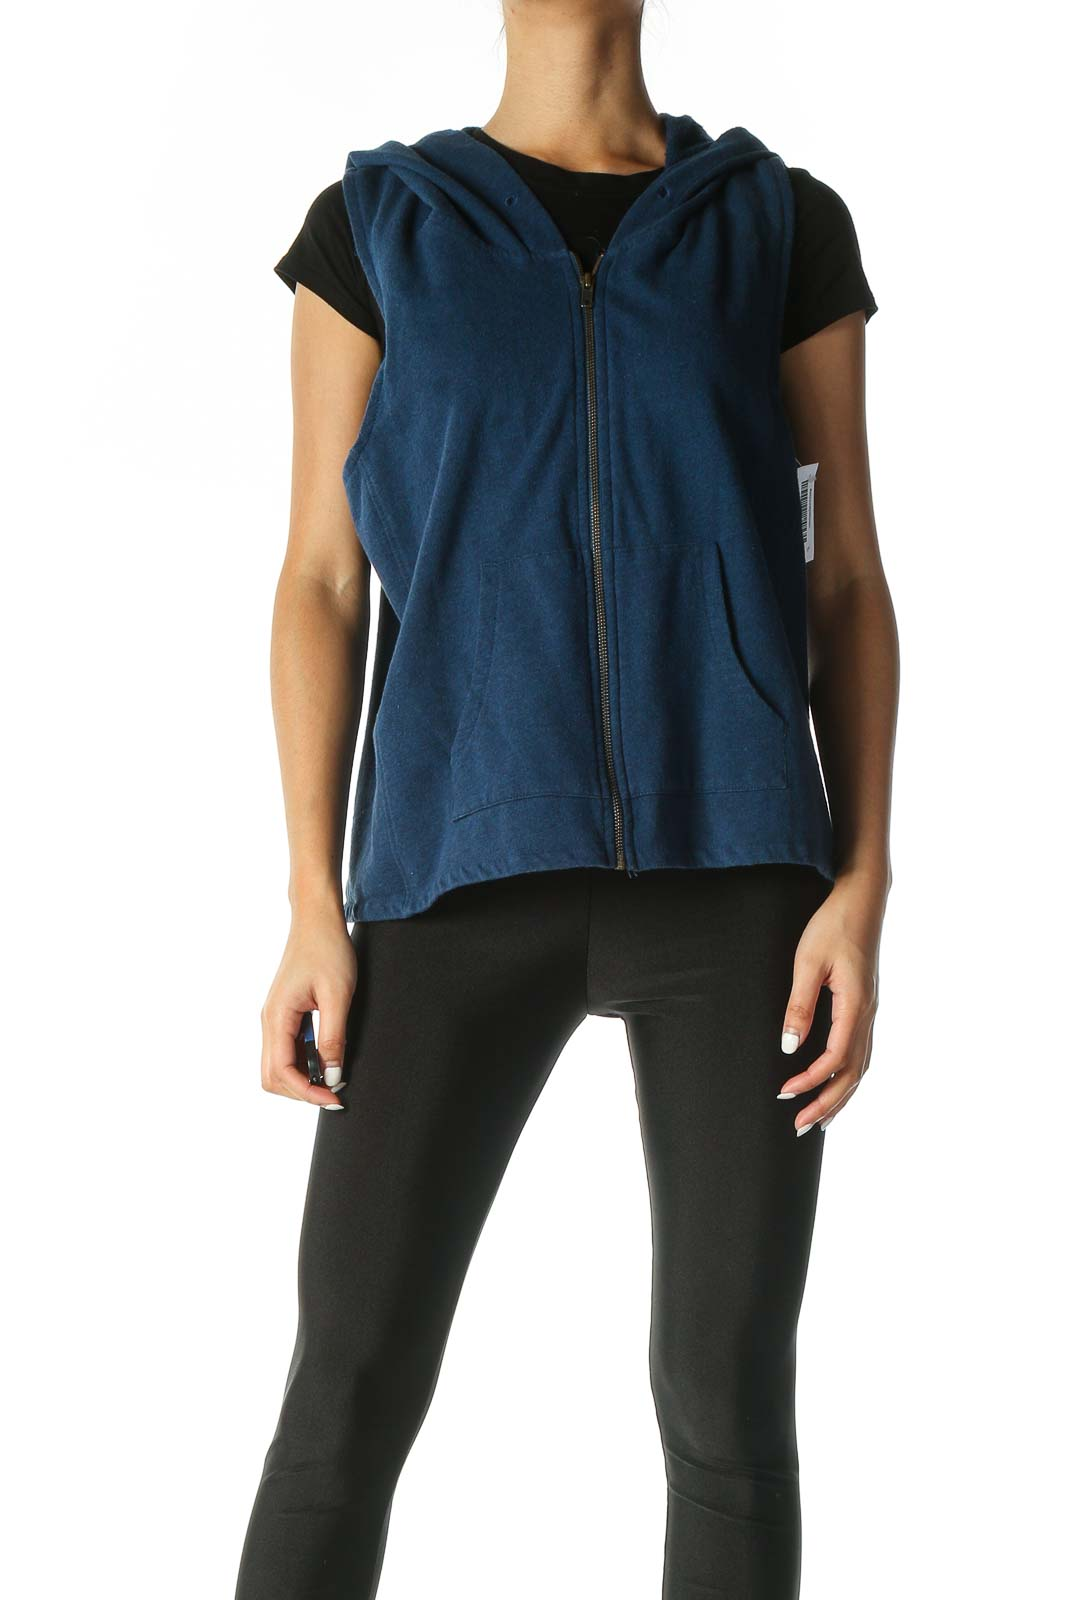 Blue Sleeveless Sweatshirts Front